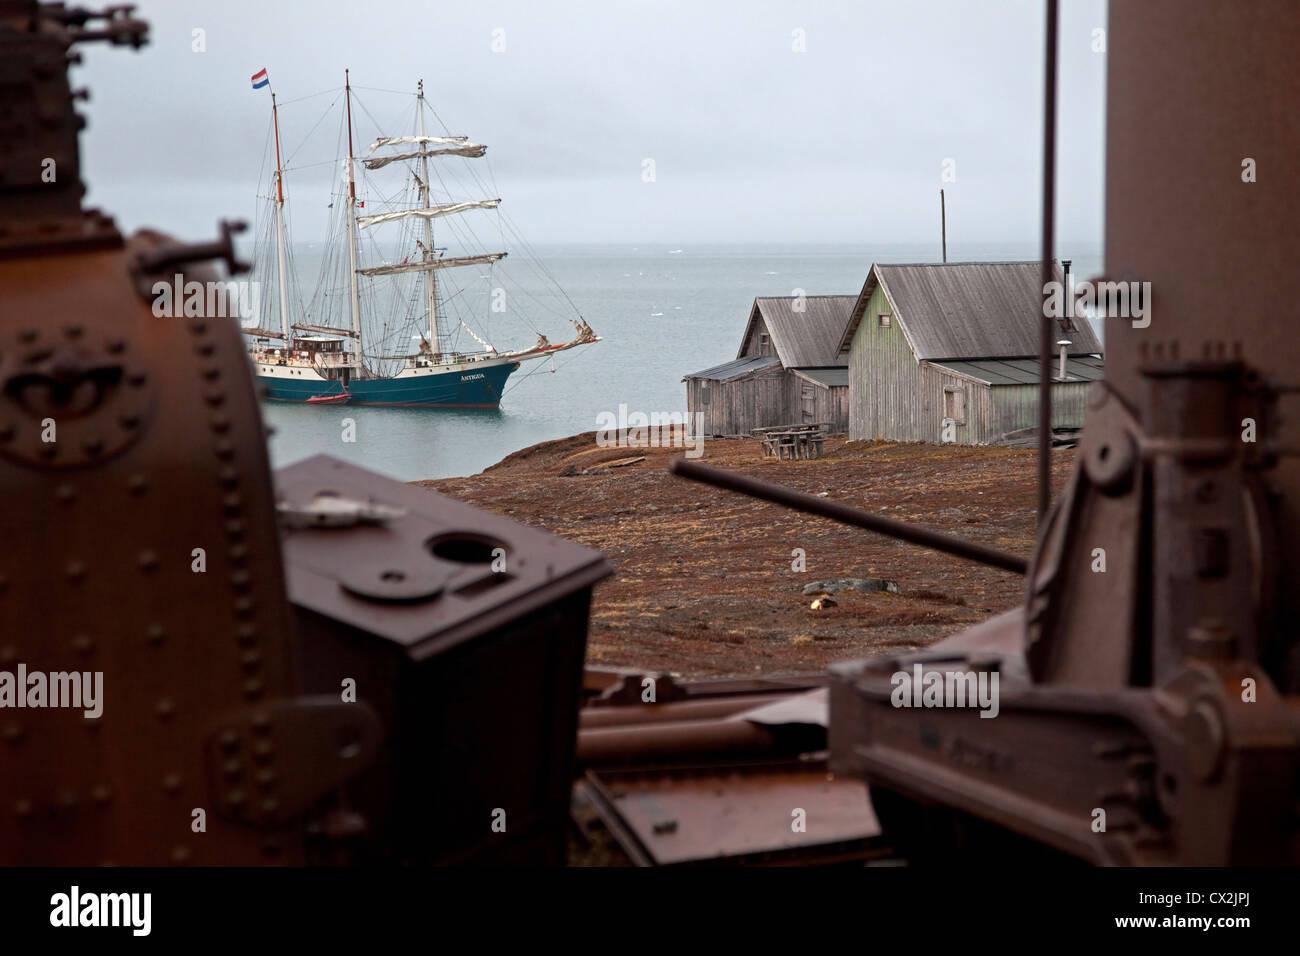 Sailing ship visiting Camp Mansfield, old marble quarry at Blomstrandhalvoya / Blomstrandhalvøya, Svalbard, - Stock Image